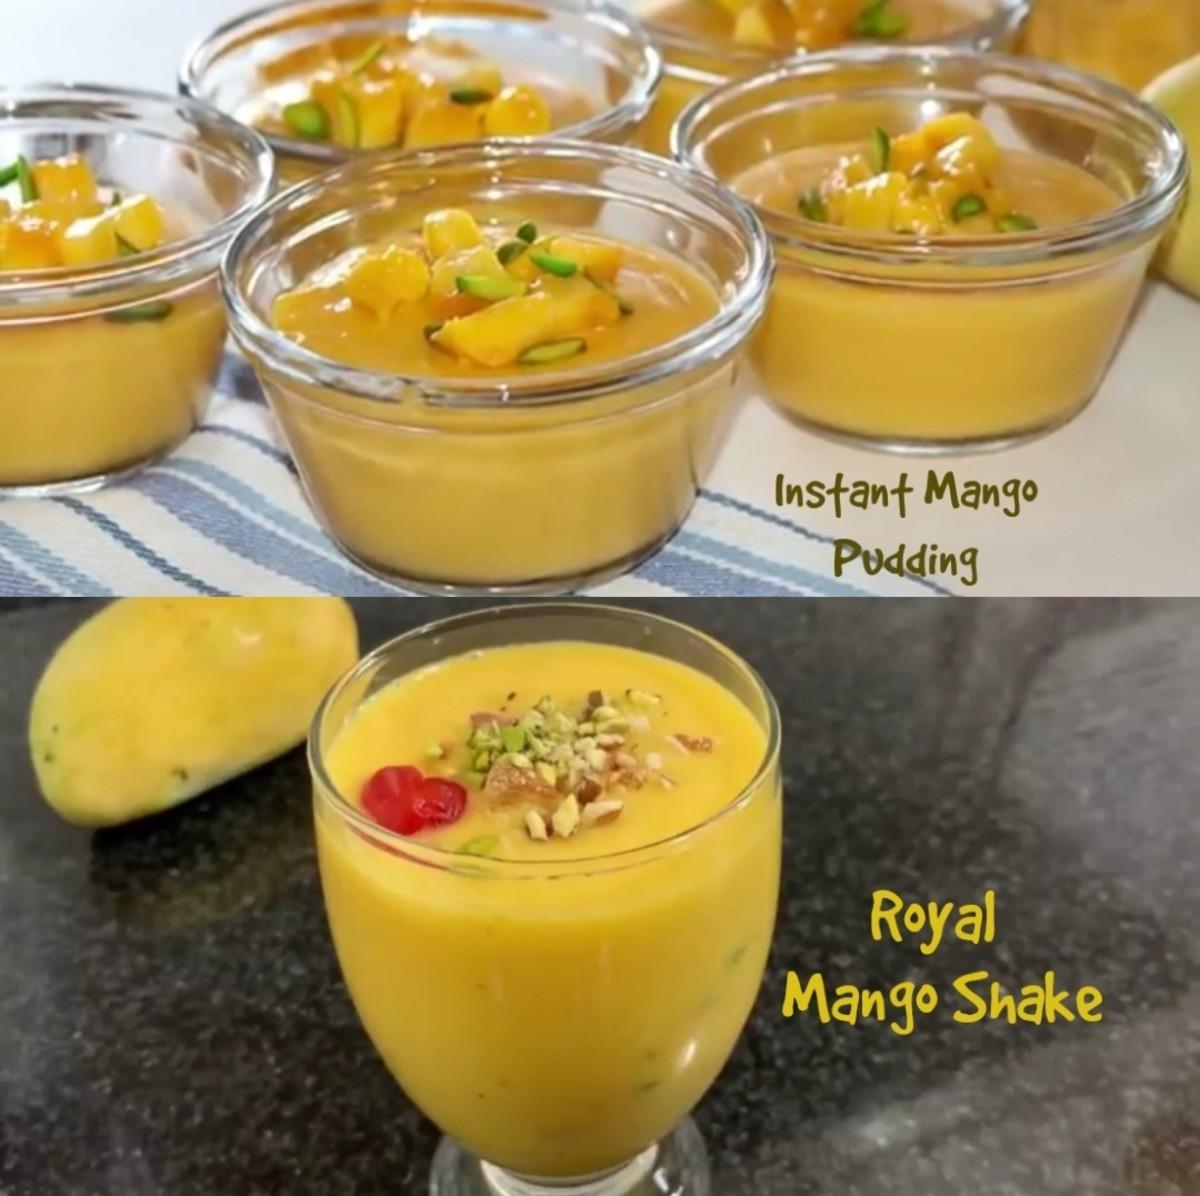 Instant Mango Pudding and Royal Mango Shake From the Summer Season